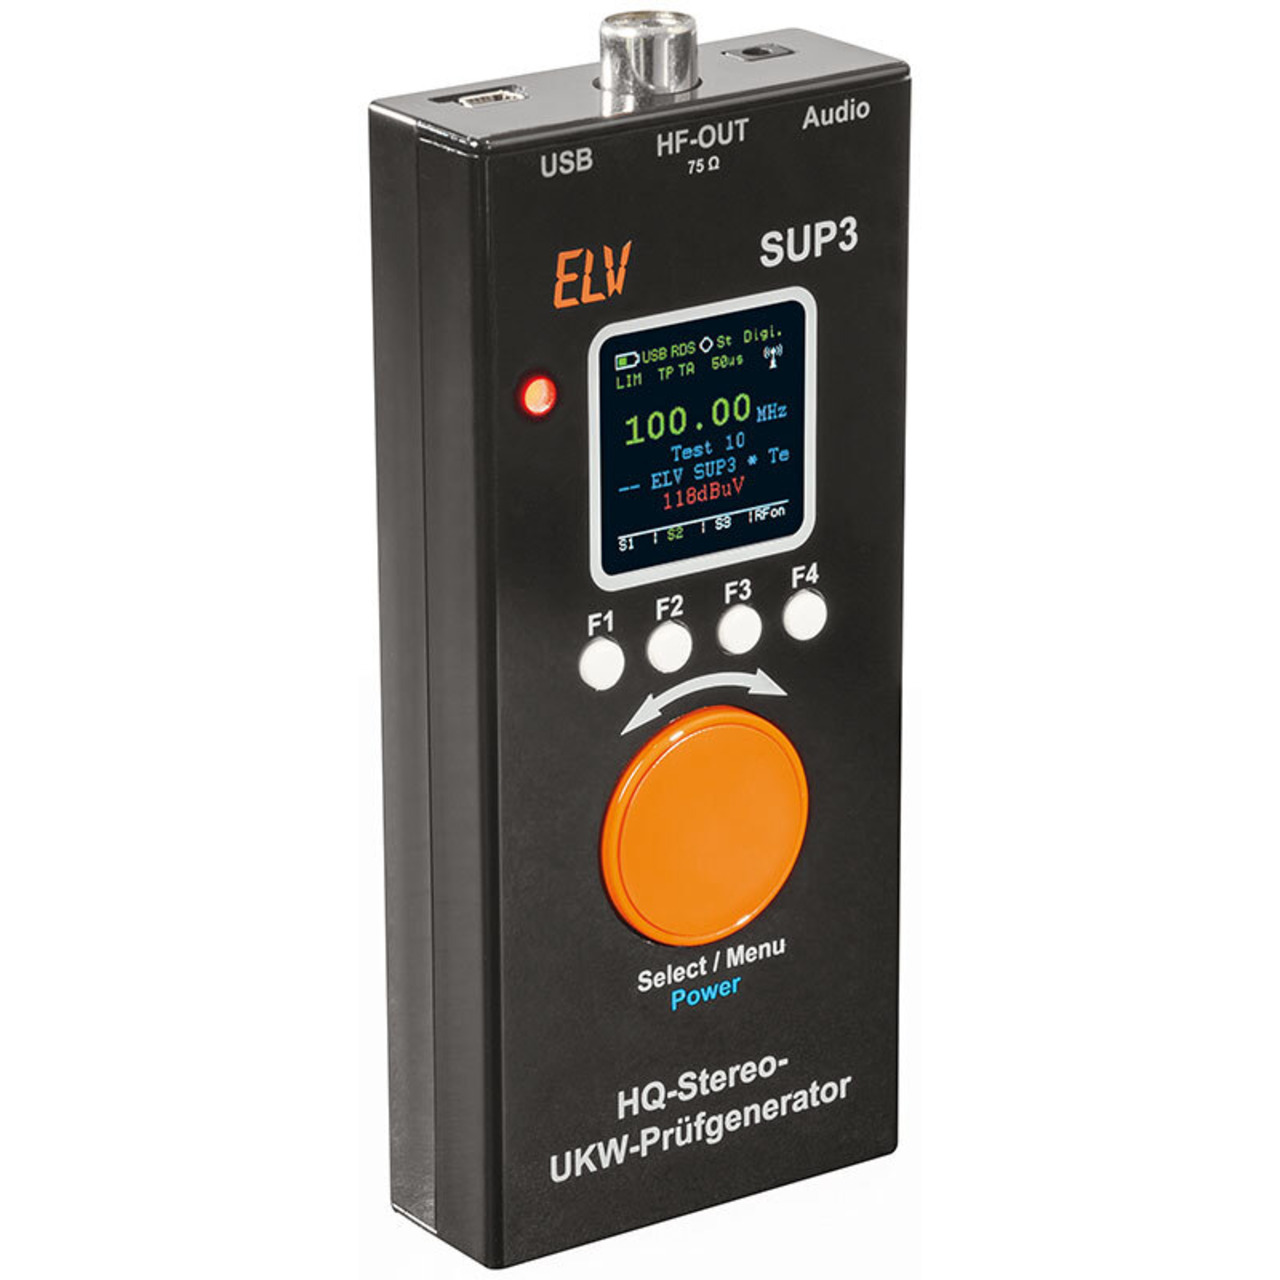 ELV Bausatz HQ-Stereo-UKW-Prüfgenerator mit OLED-Display SUP 3